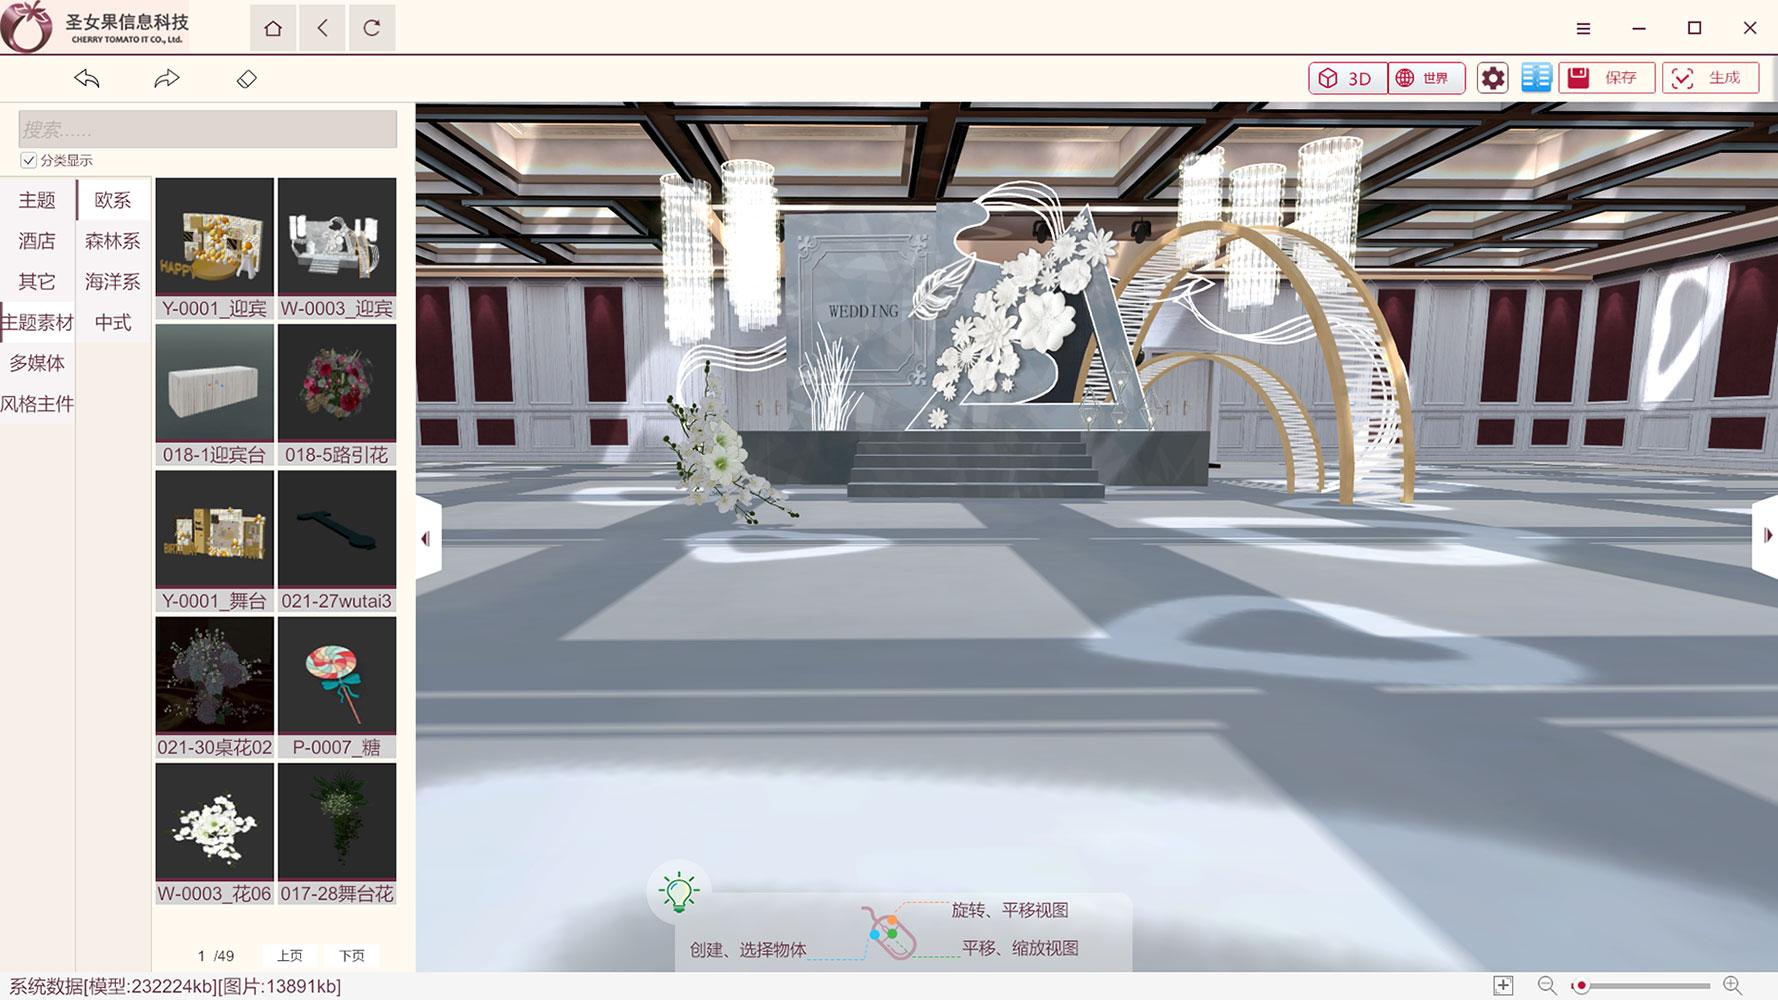 VR可编辑化3D婚庆场景营销系统软件开发 软件定制开发